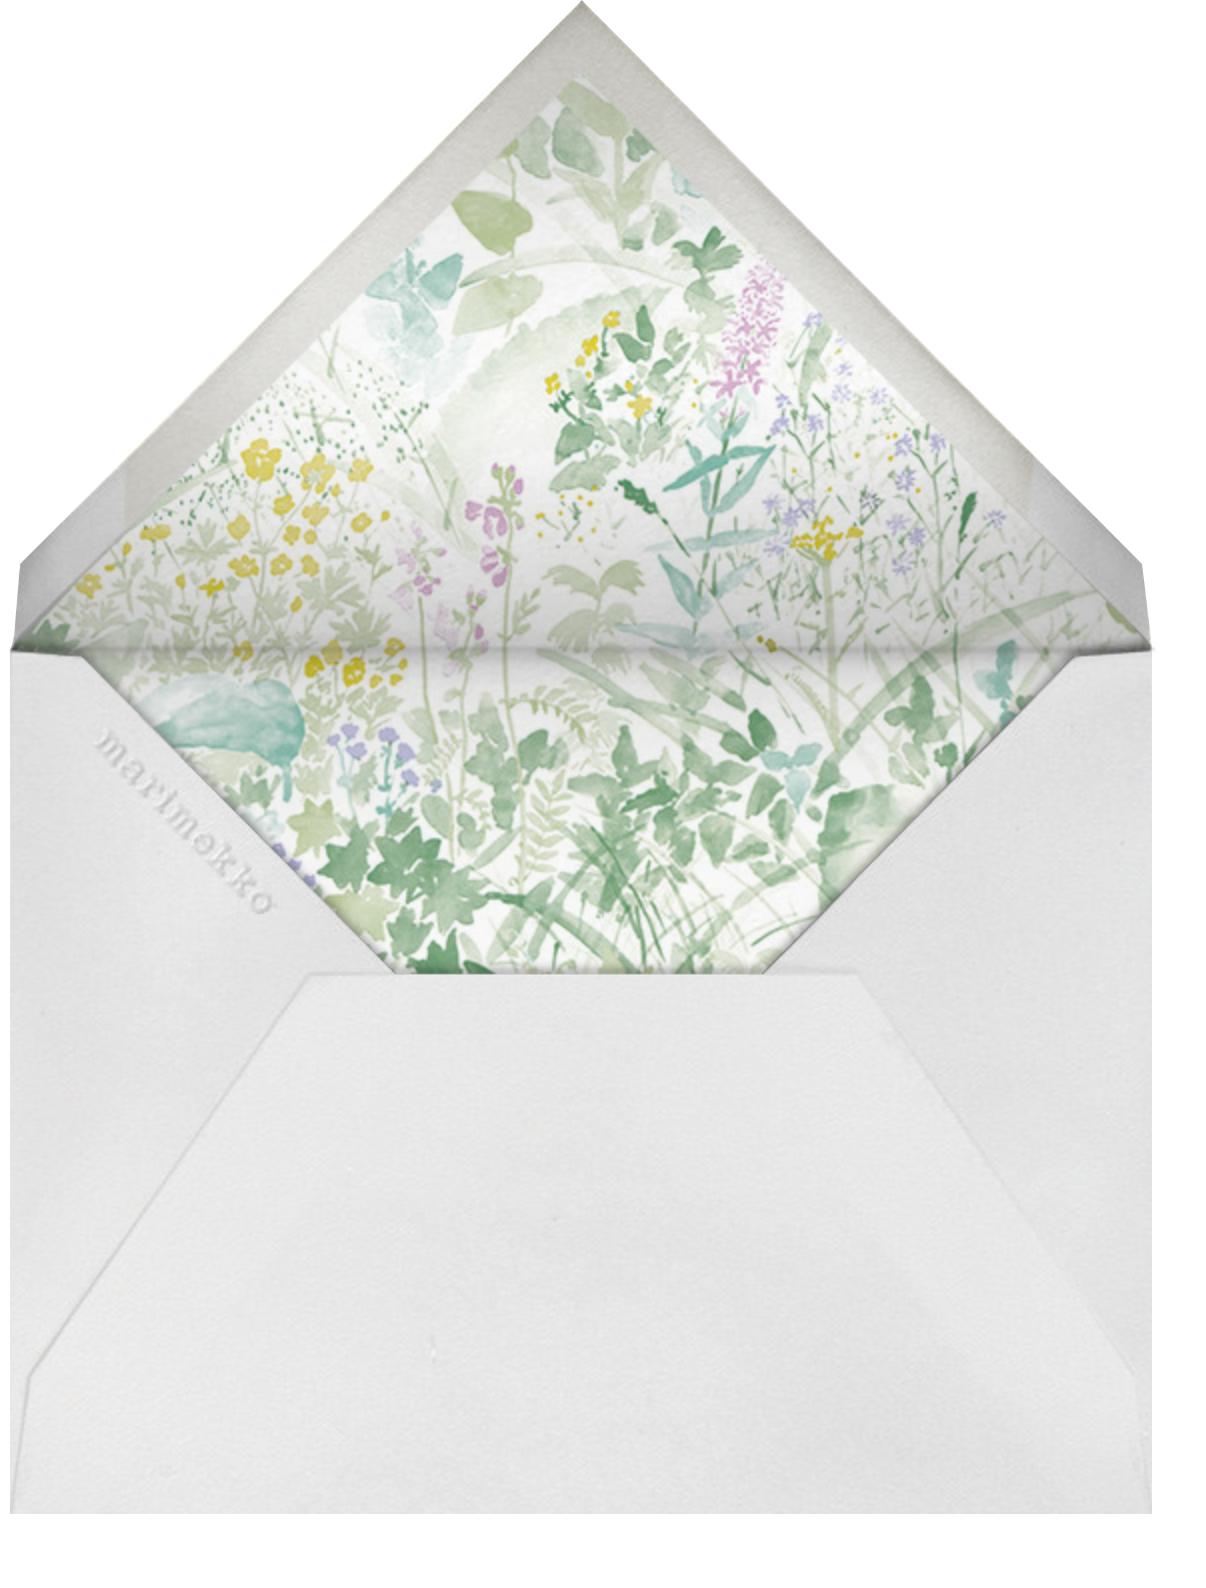 Kesanto (Tall) - Marimekko - Baby shower - envelope back